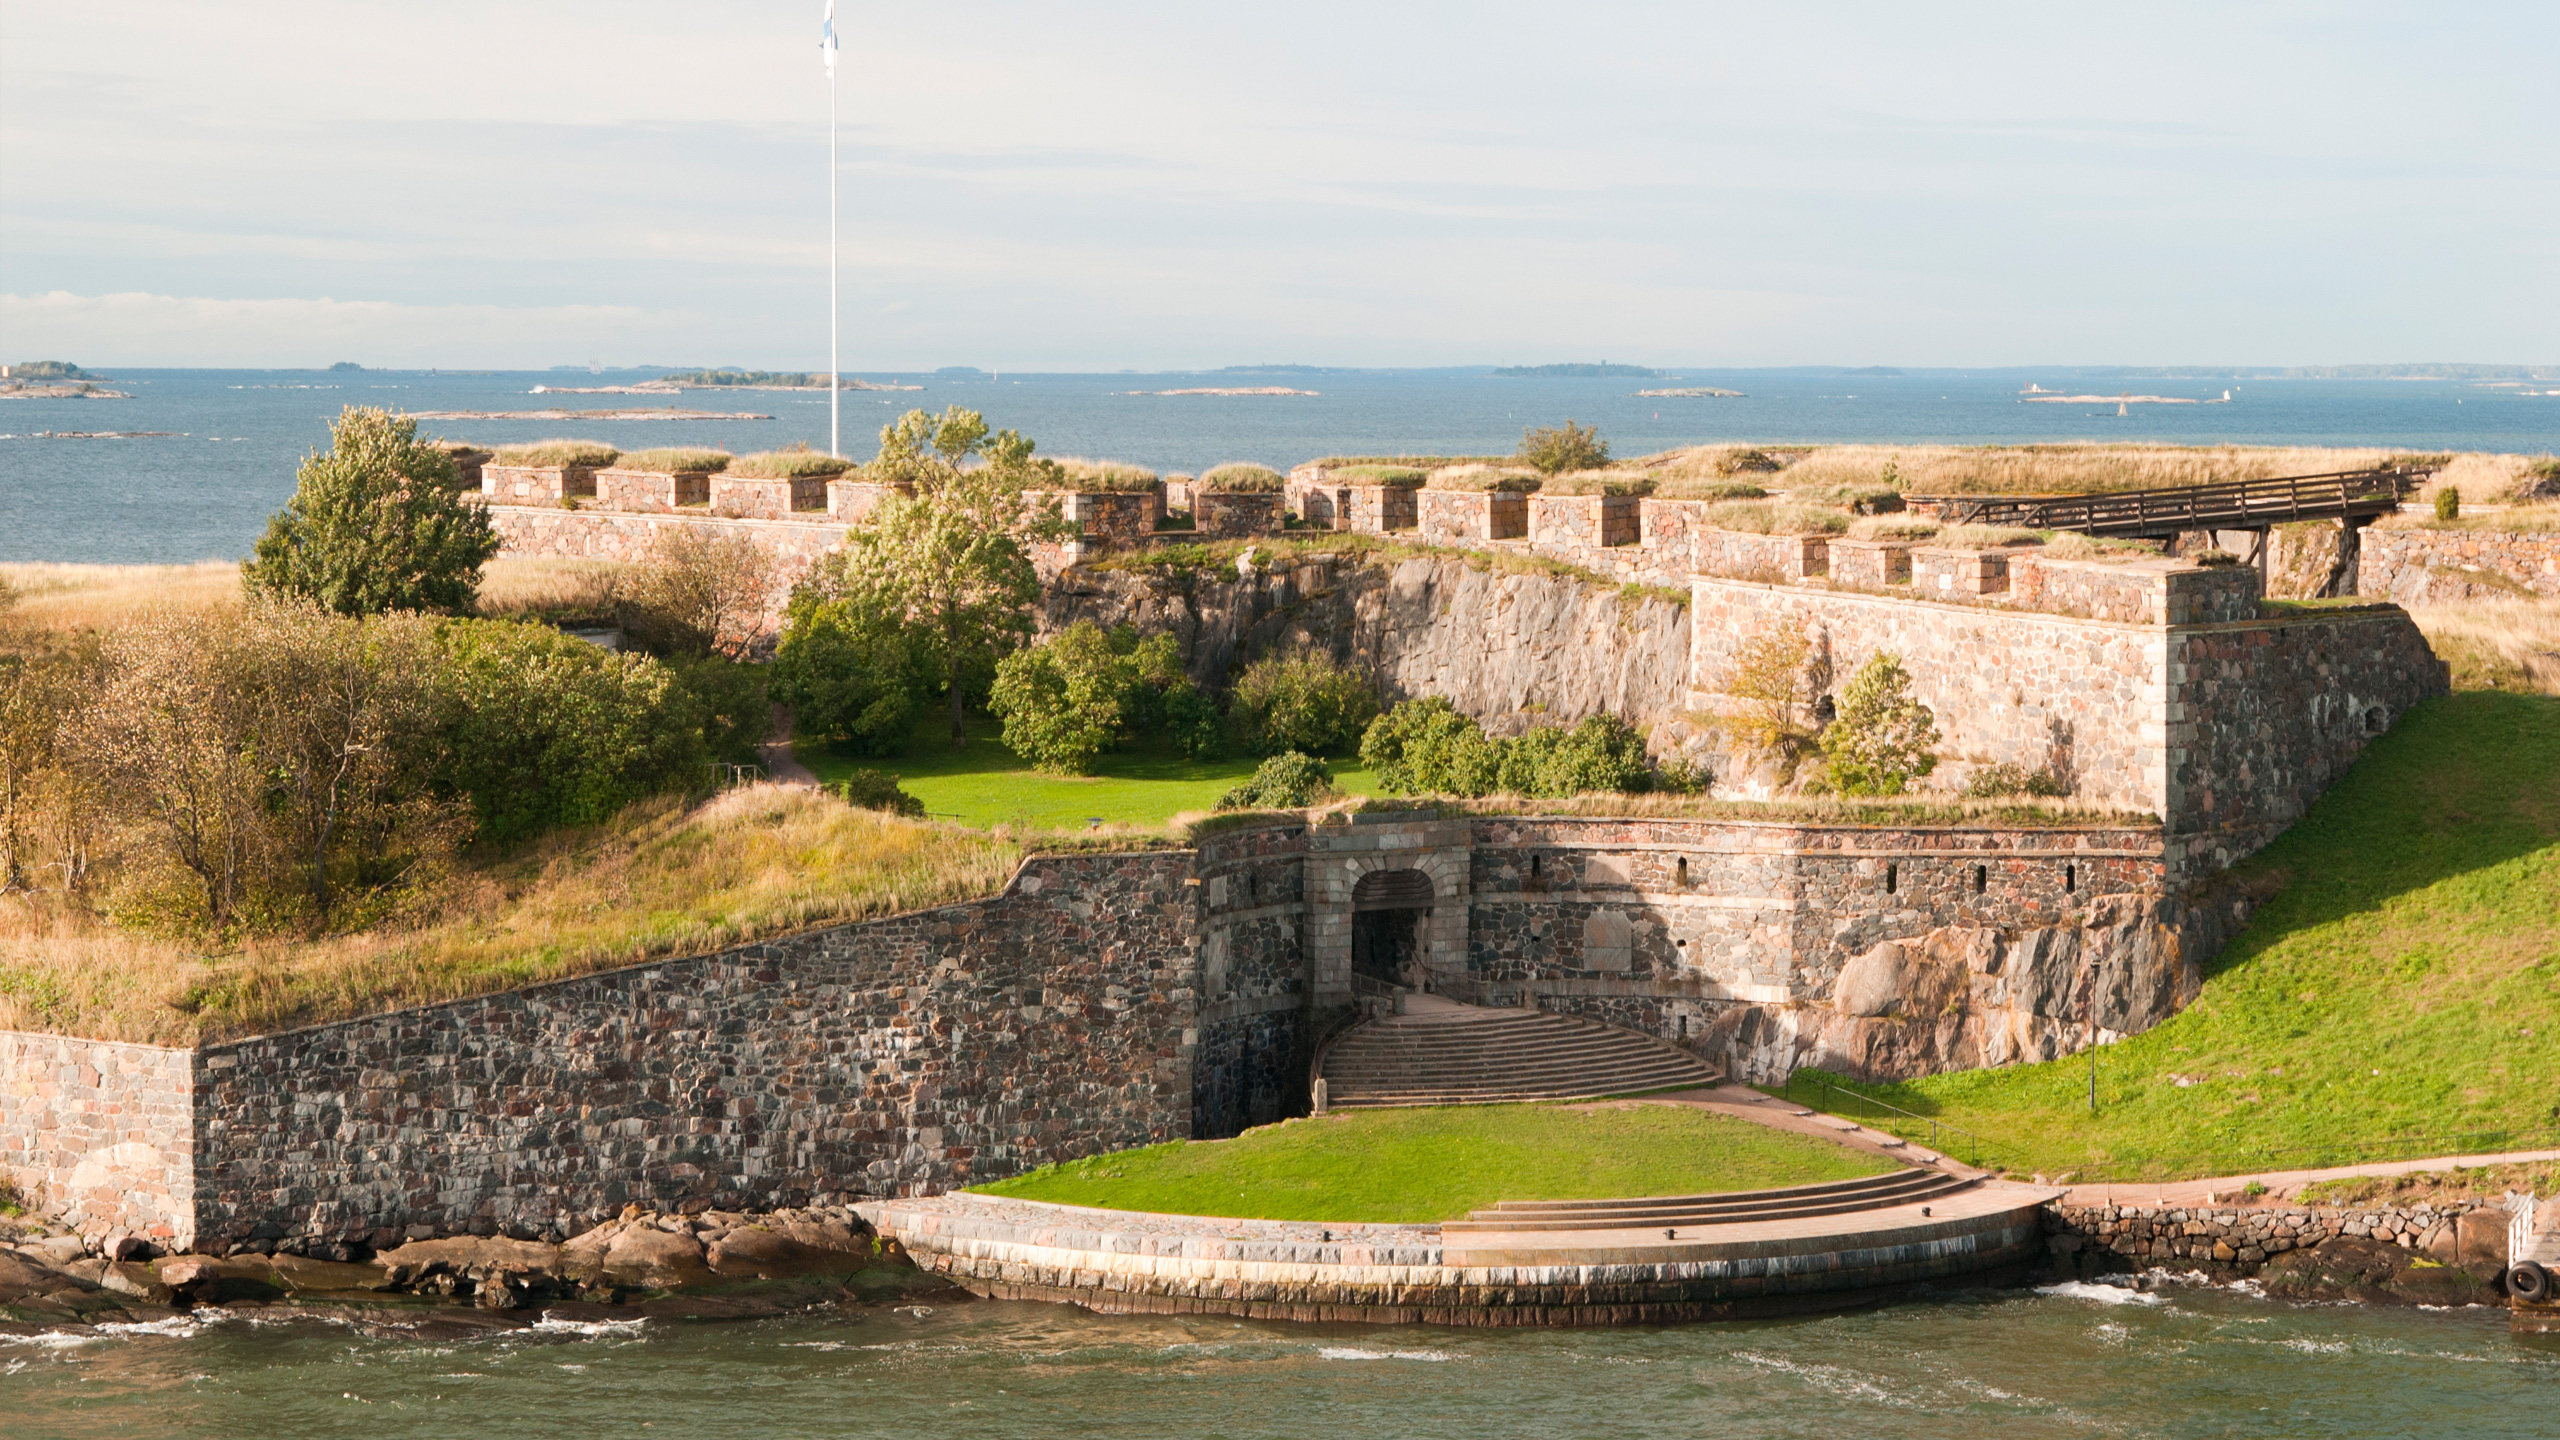 Suomenlinnan bastionit